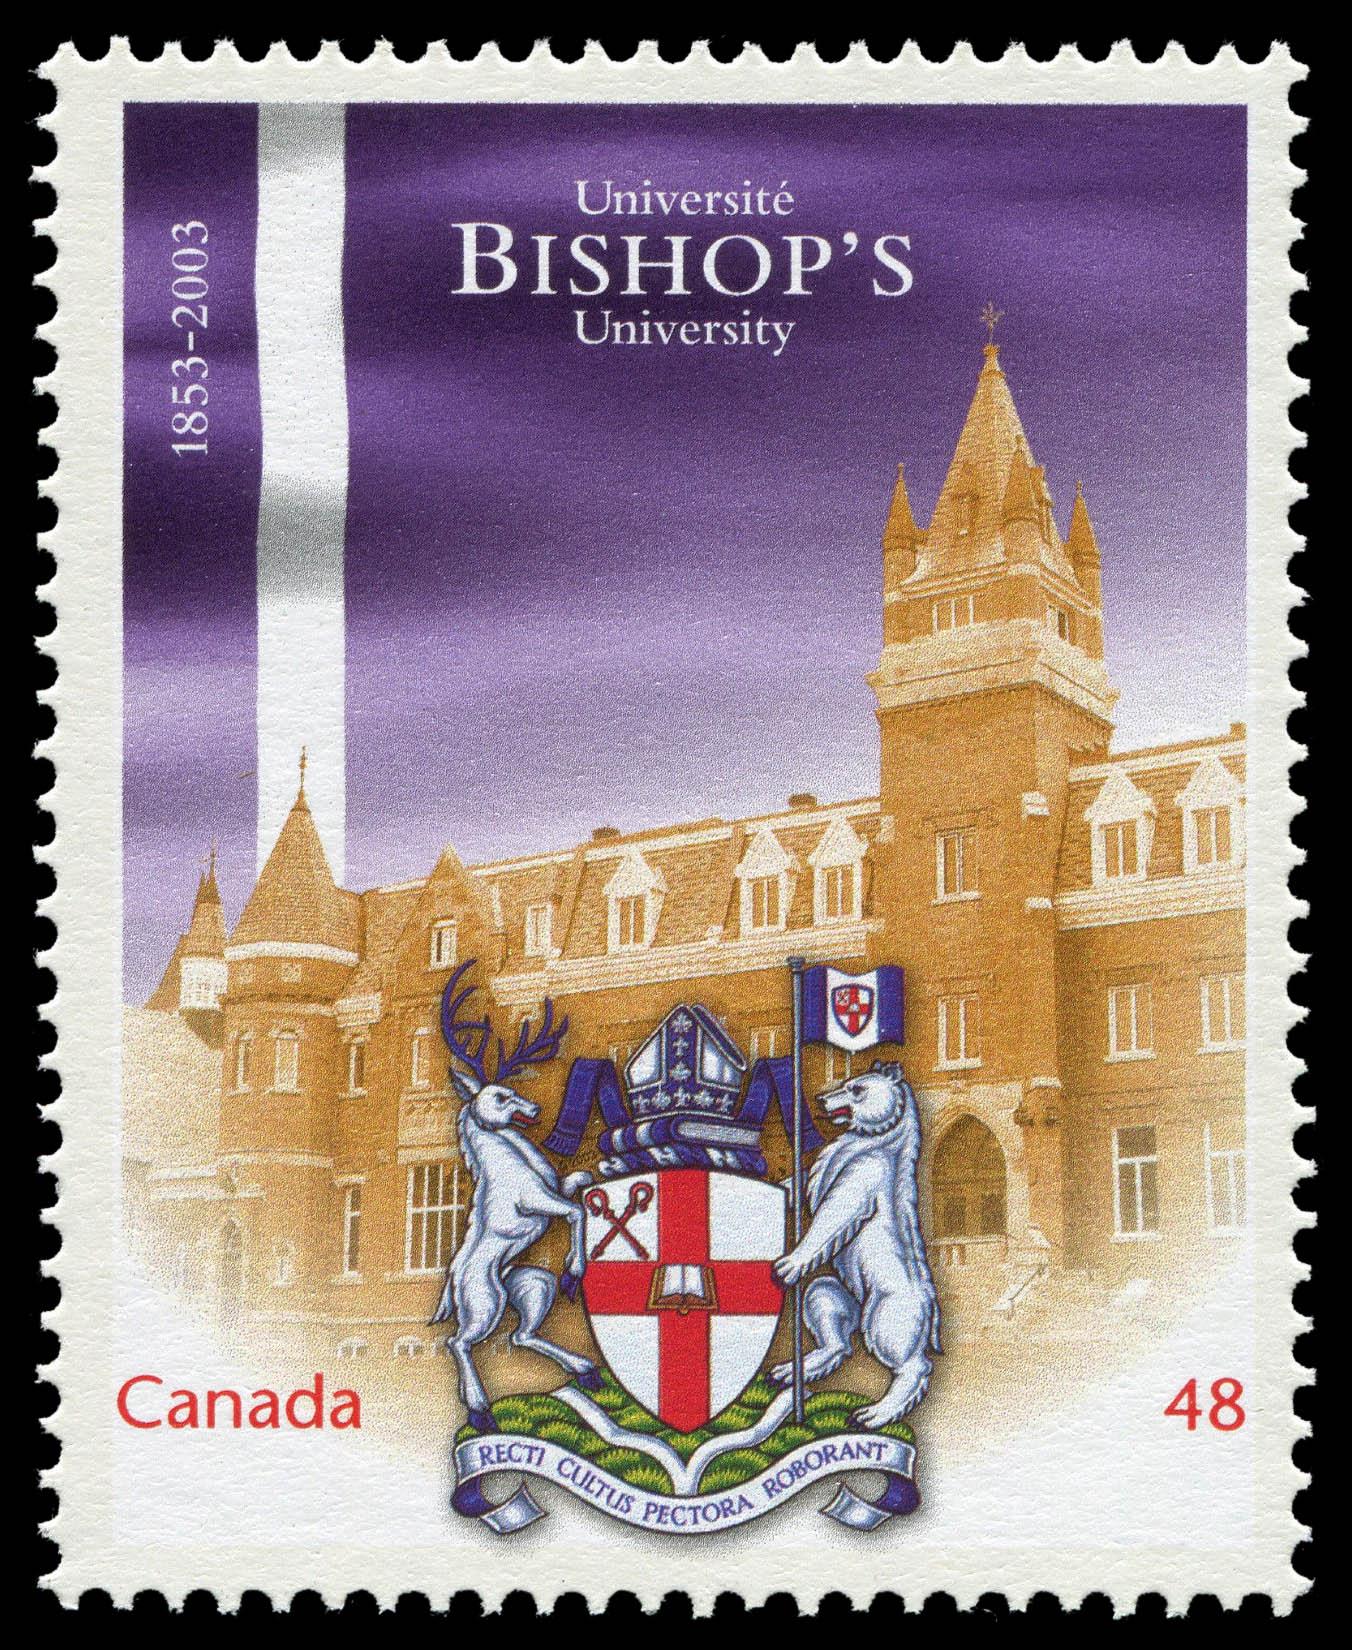 Bishop's University, 1853-2003 Canada Postage Stamp | Canadian Universities